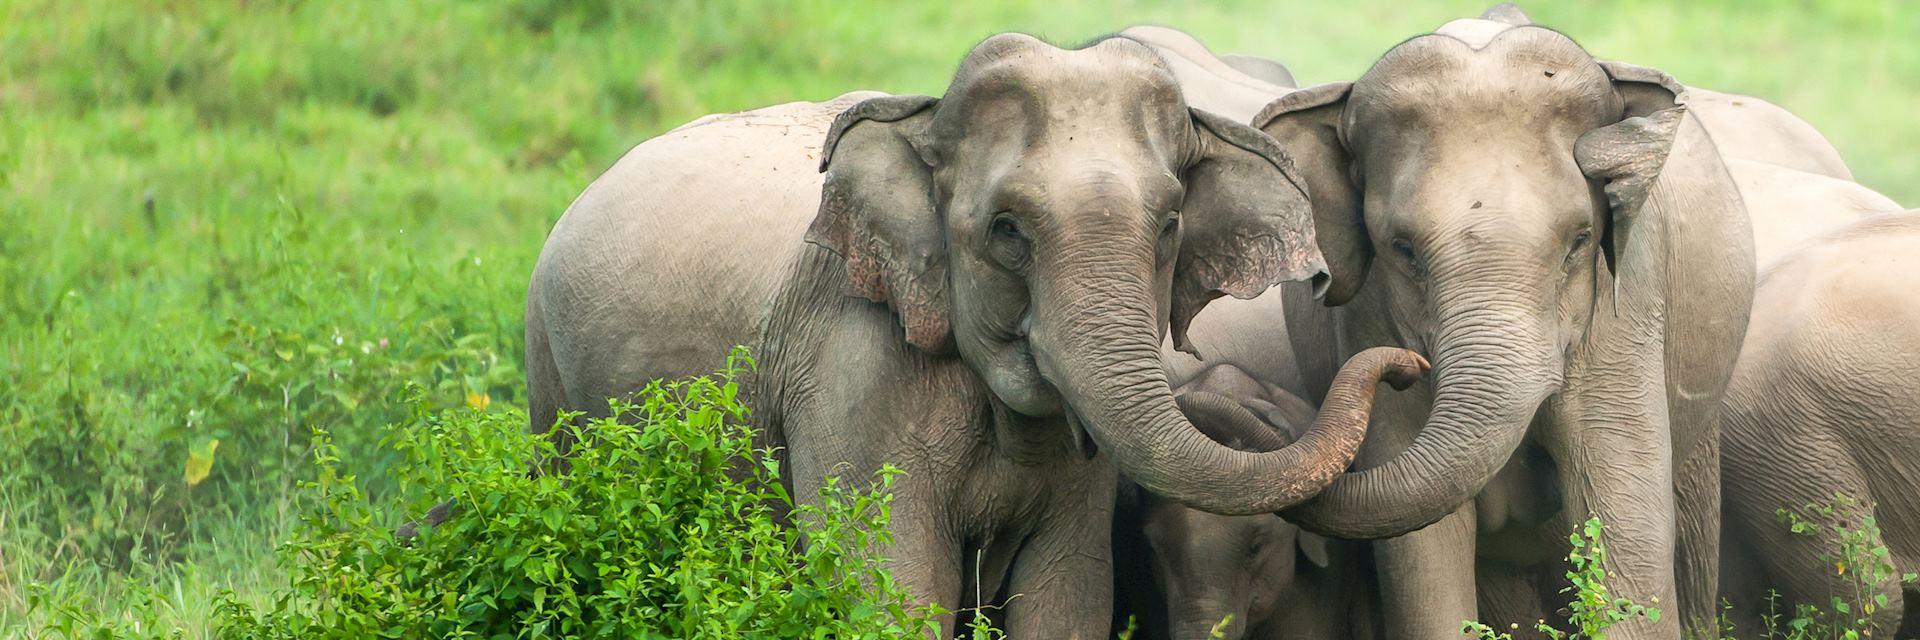 Elephant in Prachuap Khiri Khan, western Thailand